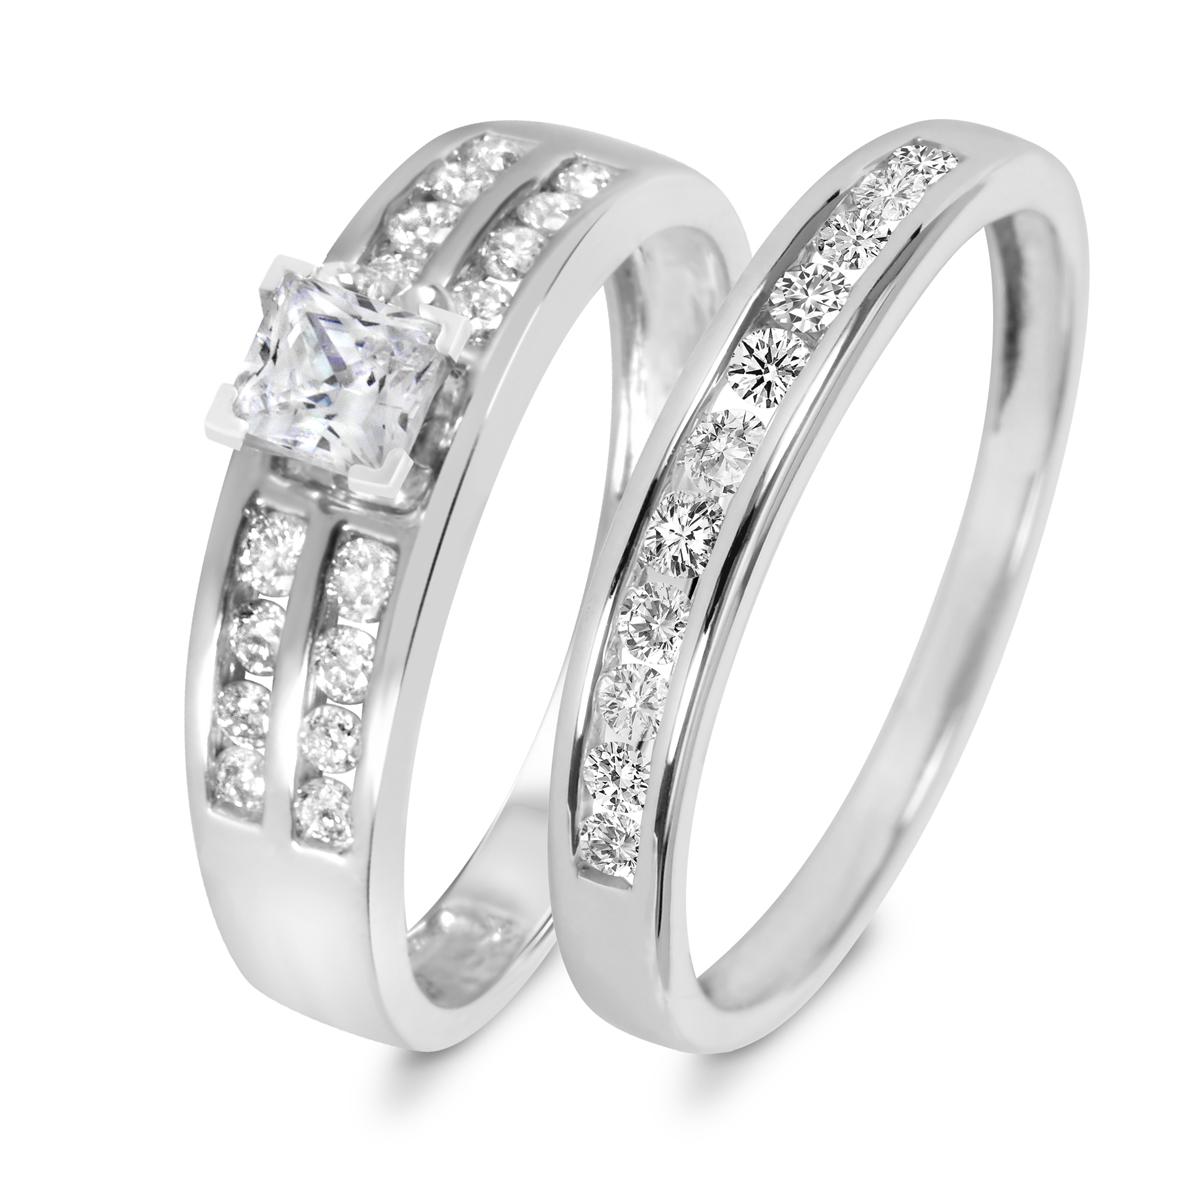 7/8 CT. T.W. Diamond Women's Bridal Wedding Ring Set 14K White Gold